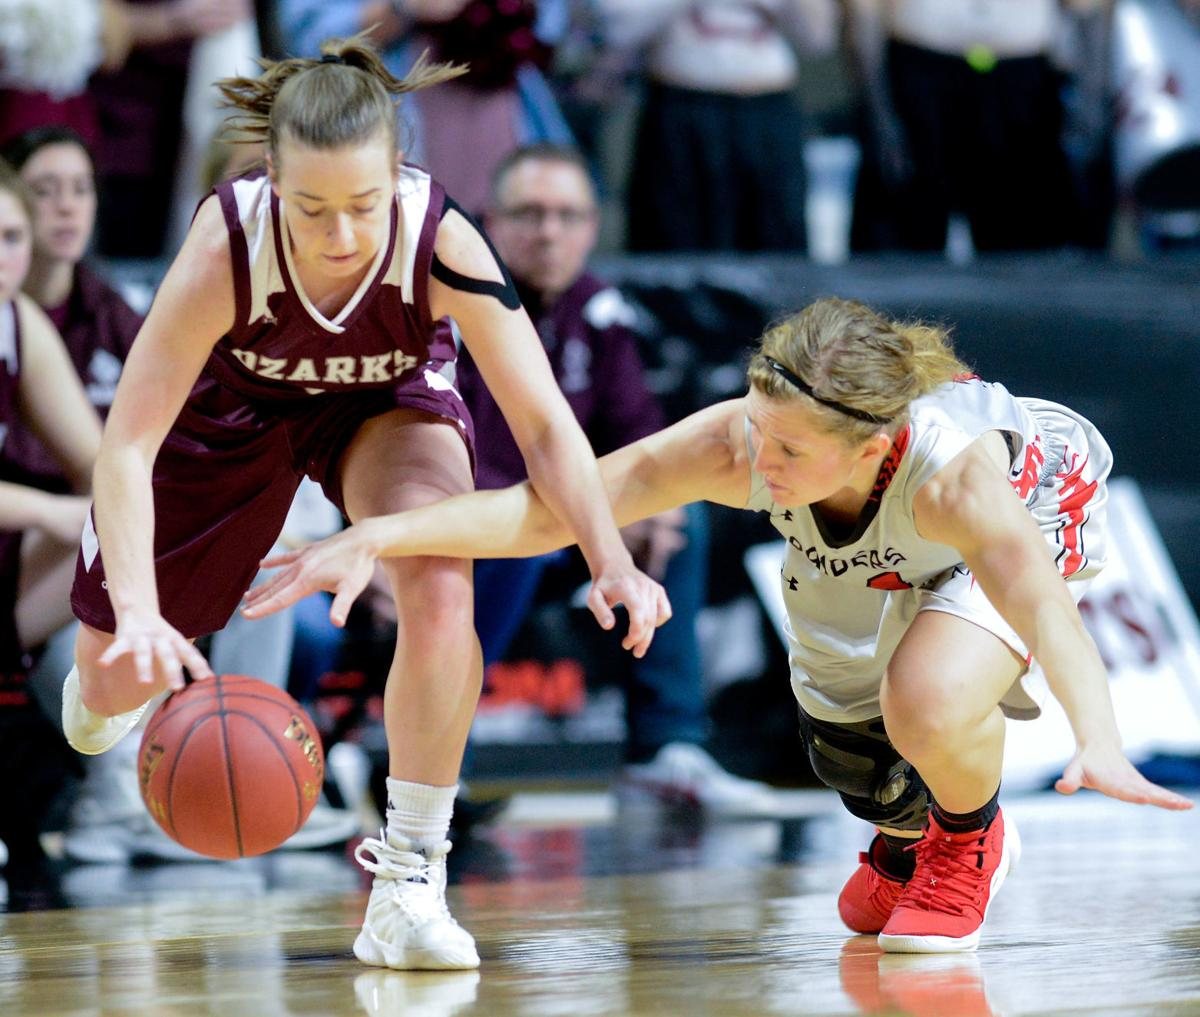 Basketball NAIA Northwestern vs. Ozarks